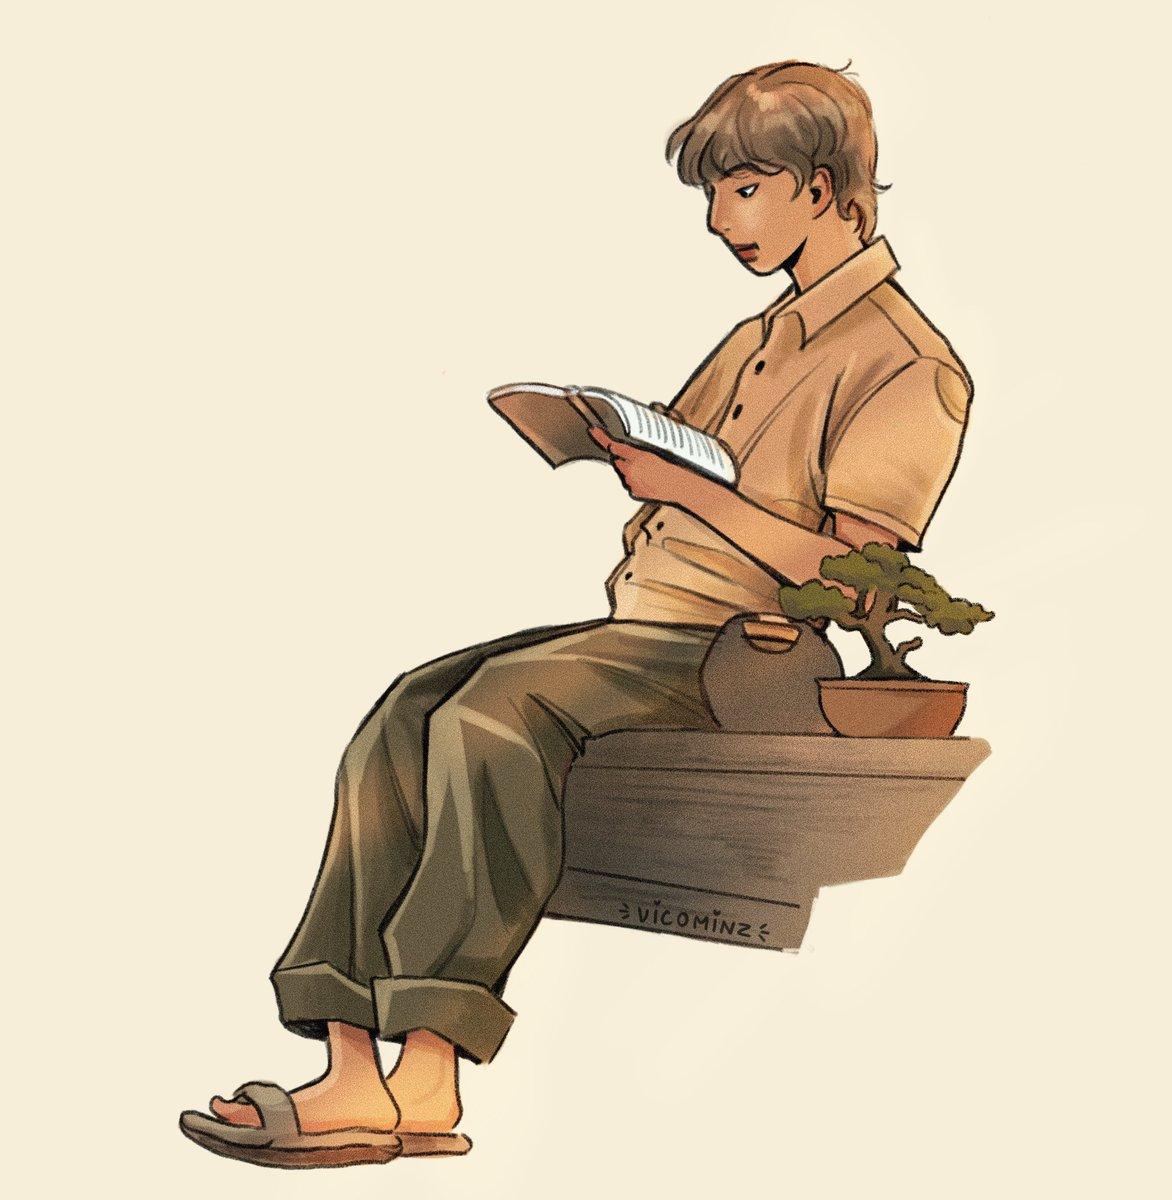 RT @vicominz: namjoon y su bonsai    #namjoon #btsfanart #illustration https://t.co/39OKppmoR1